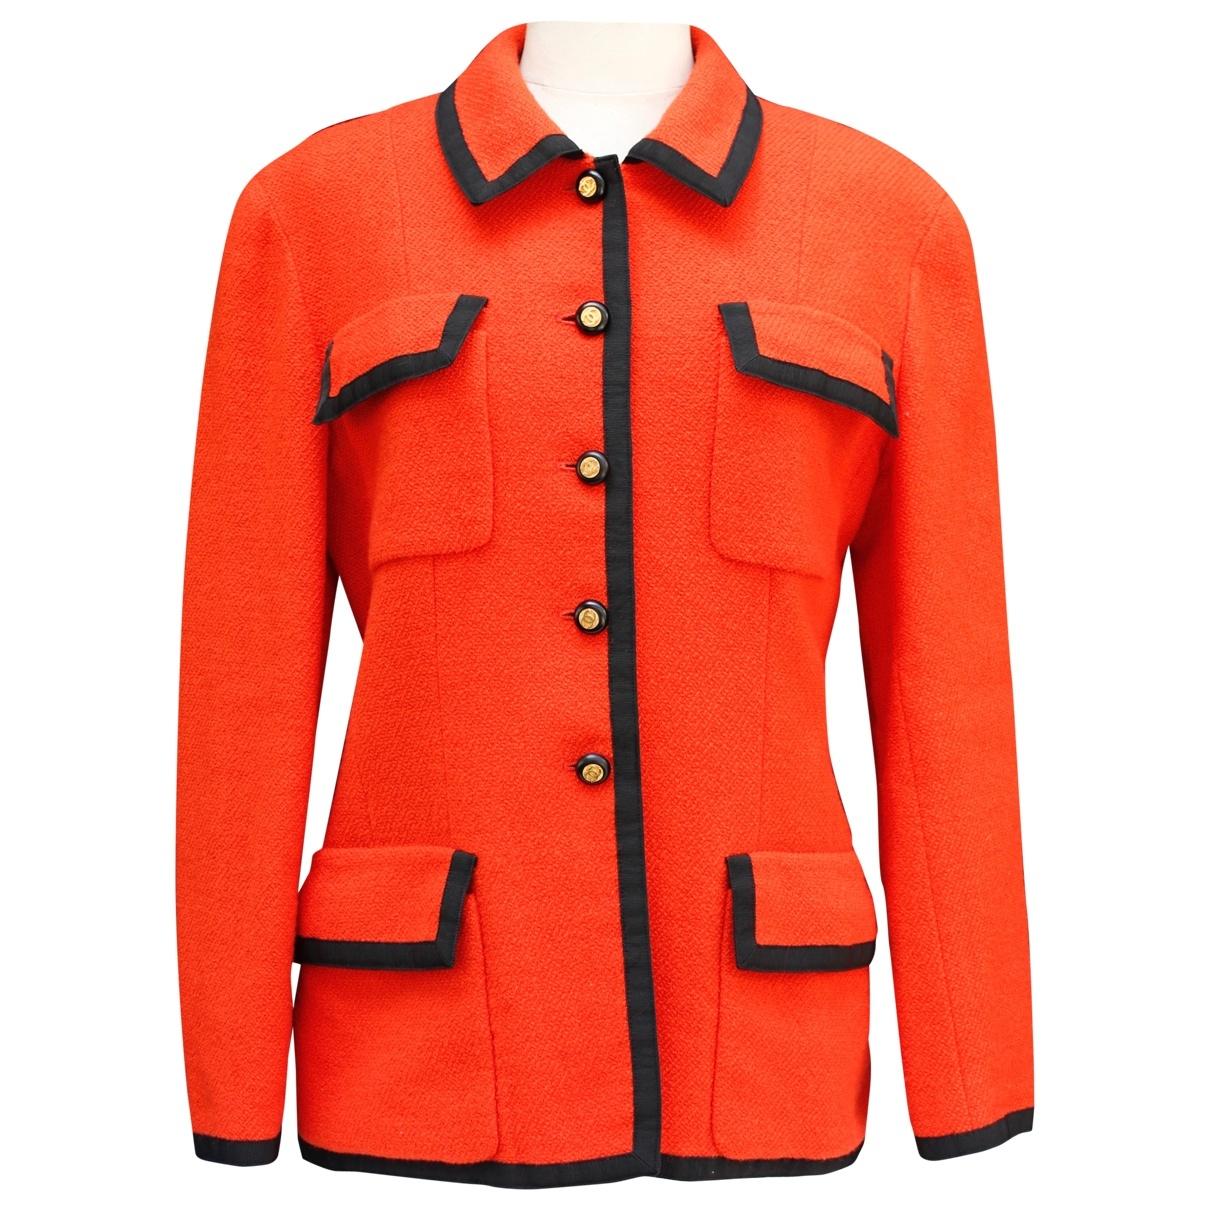 Chanel \N Orange Tweed jacket for Women 42 FR